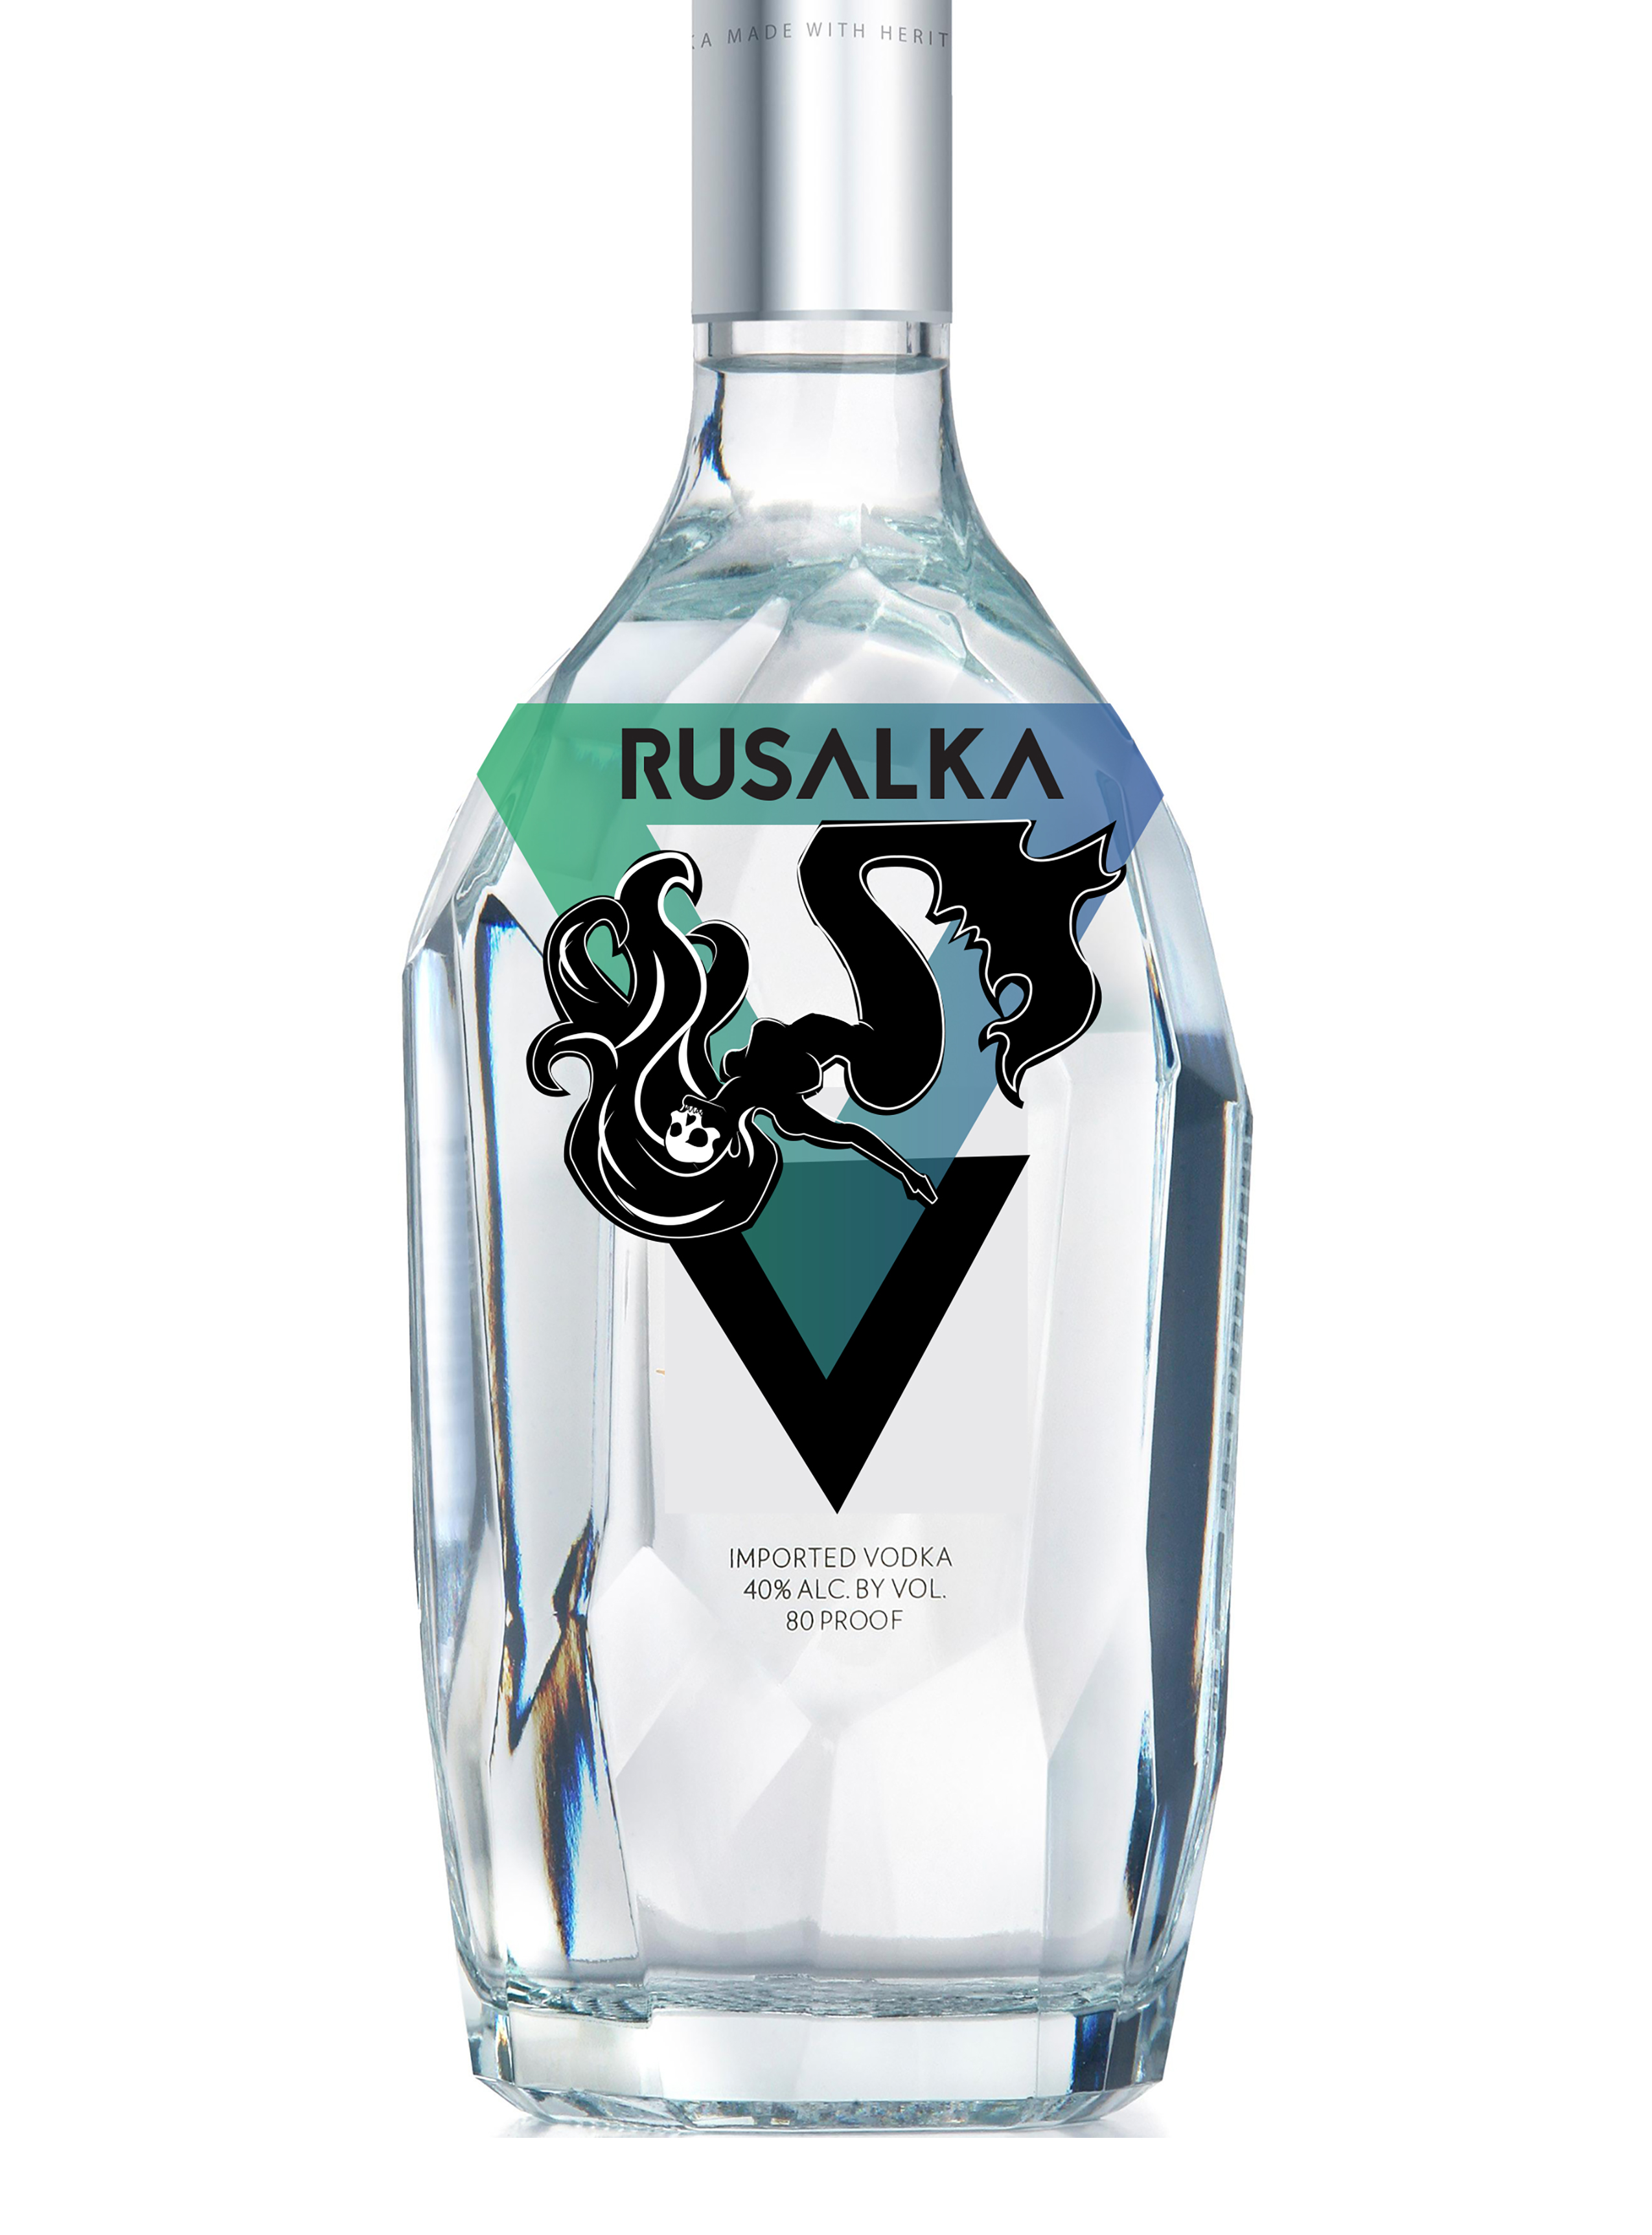 rusalka bottle